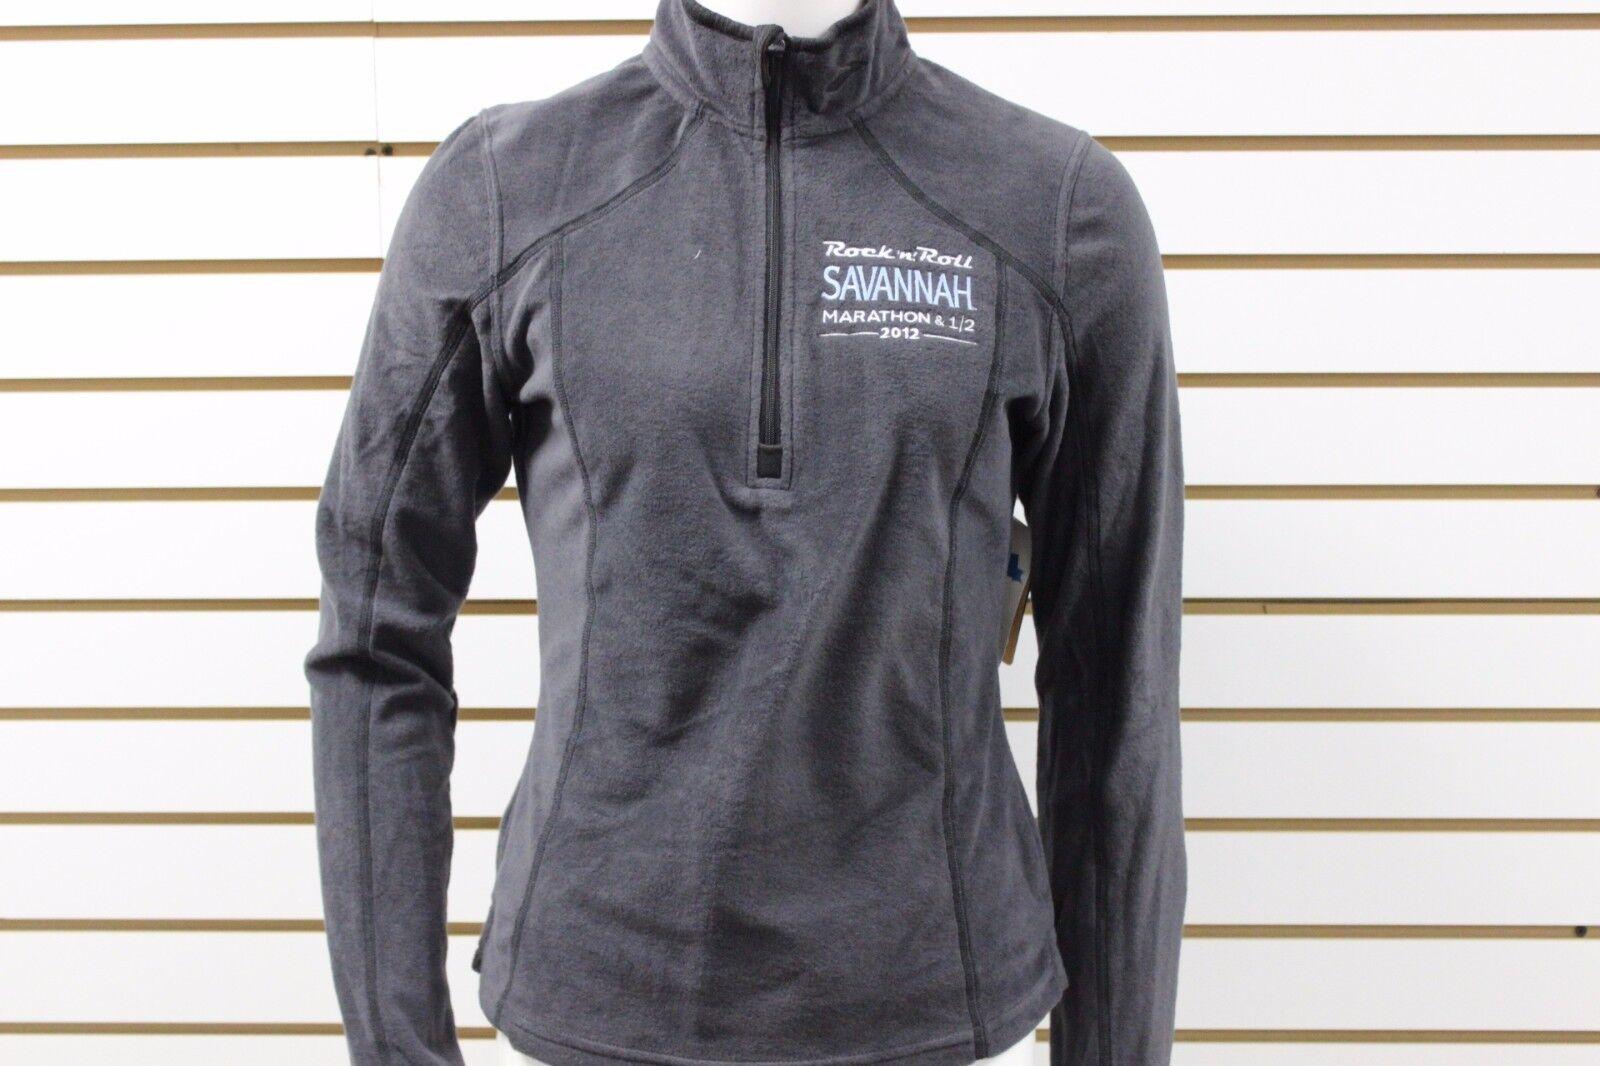 Brooks Woman's Equilibrium Technology RNR Savannah LTD Fleece 1 2 Zip Shadow